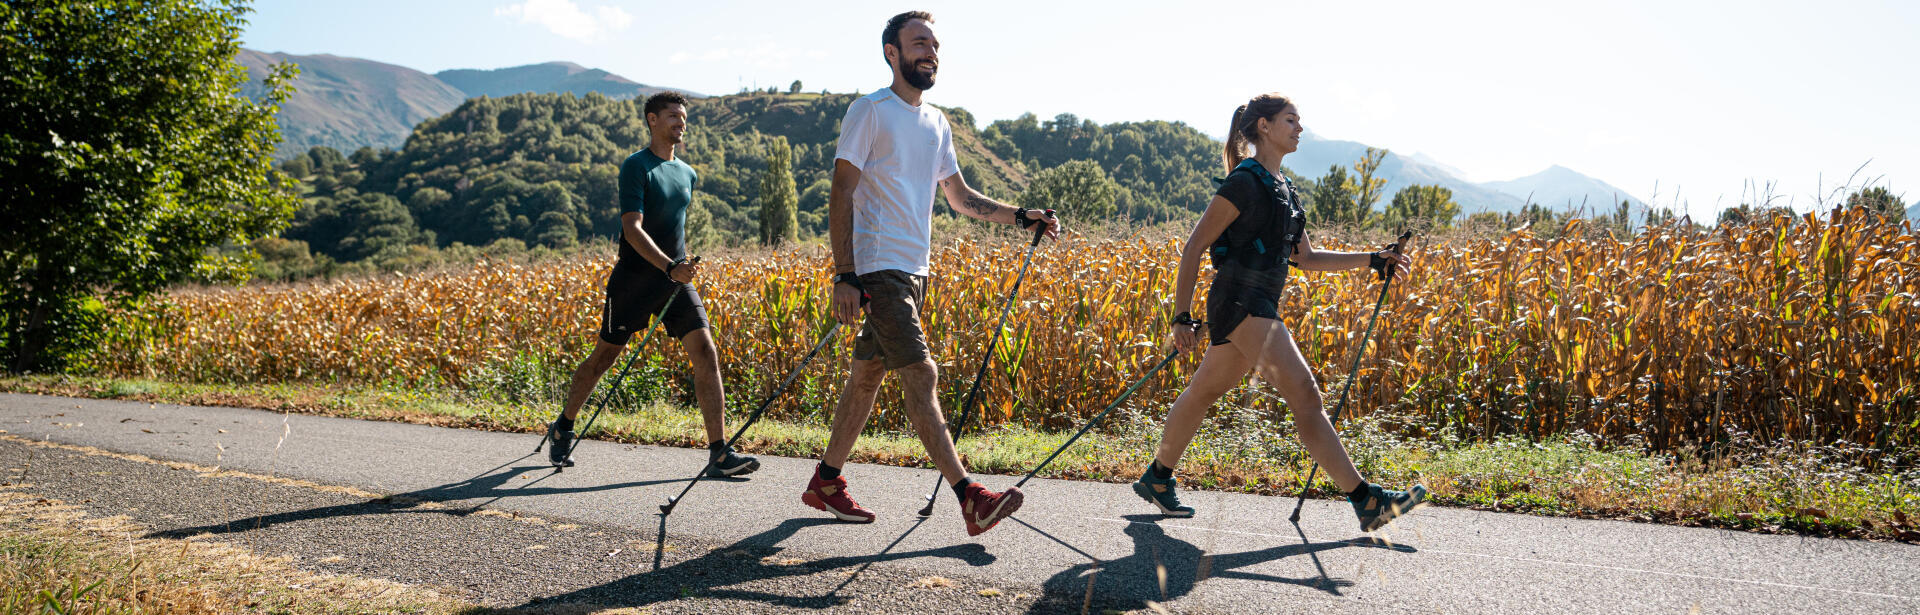 CAMMINATA SPORTIVA & NORDIC WALKING